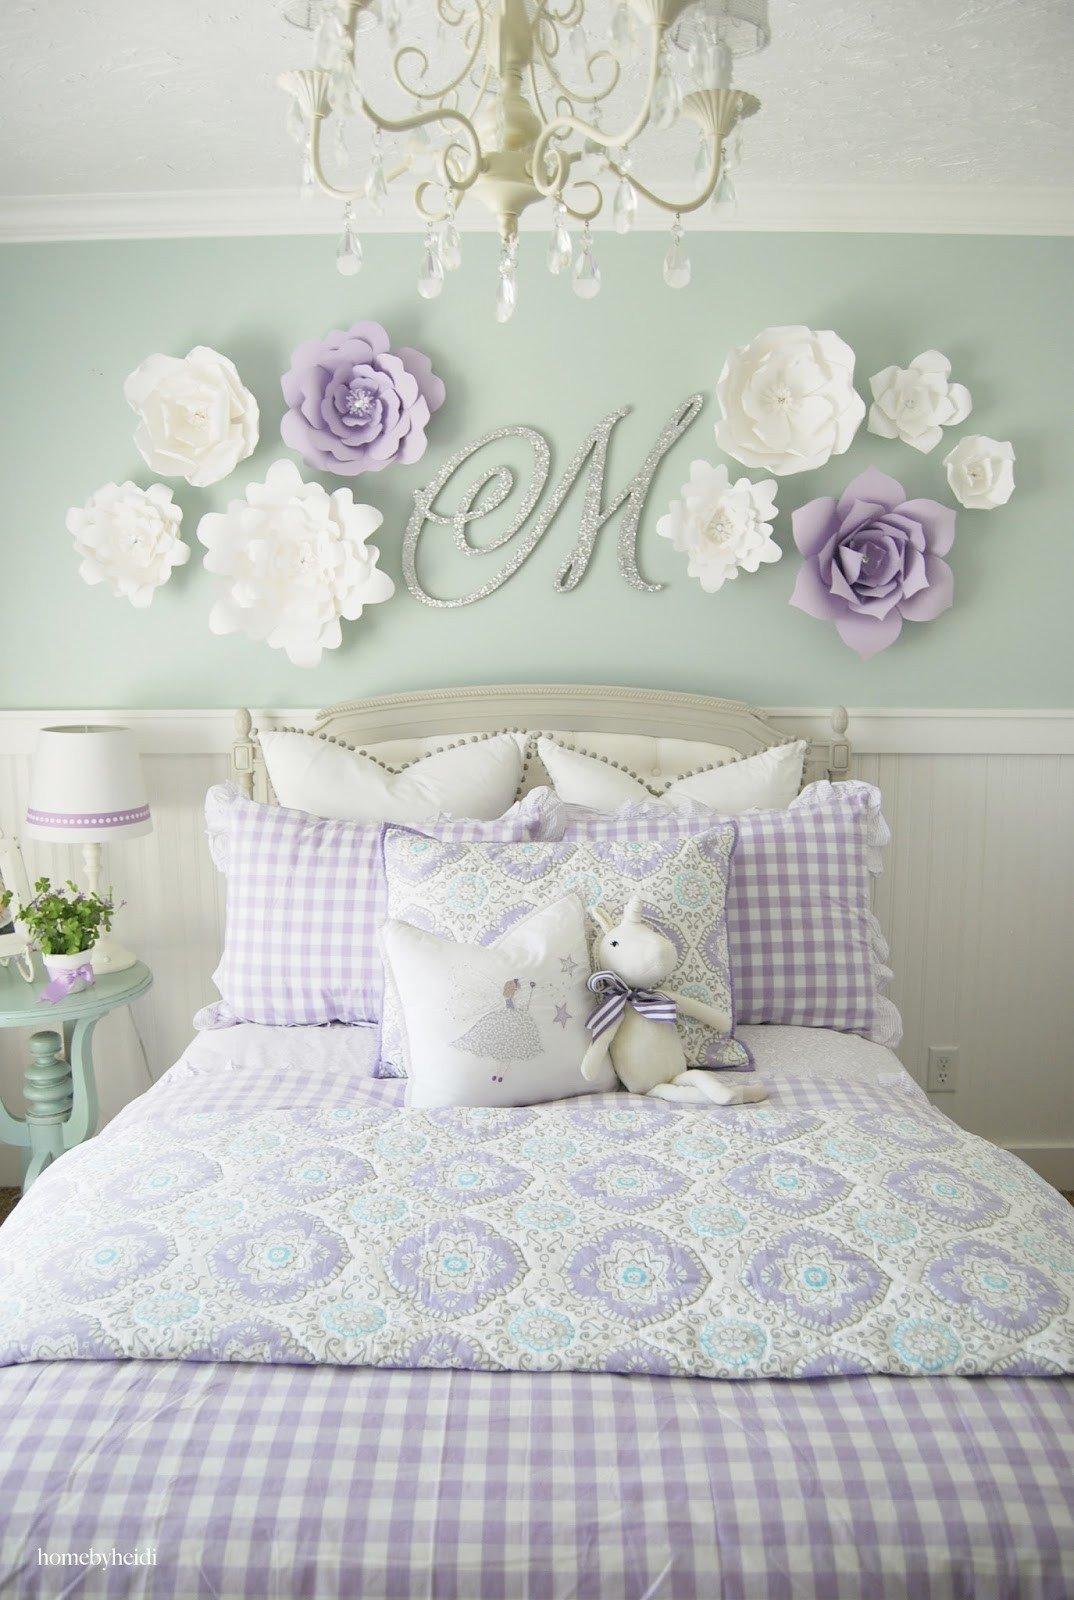 Little Girl Room Decor Ideas New Home by Heidi Purple & Turquoise Little Girls Room